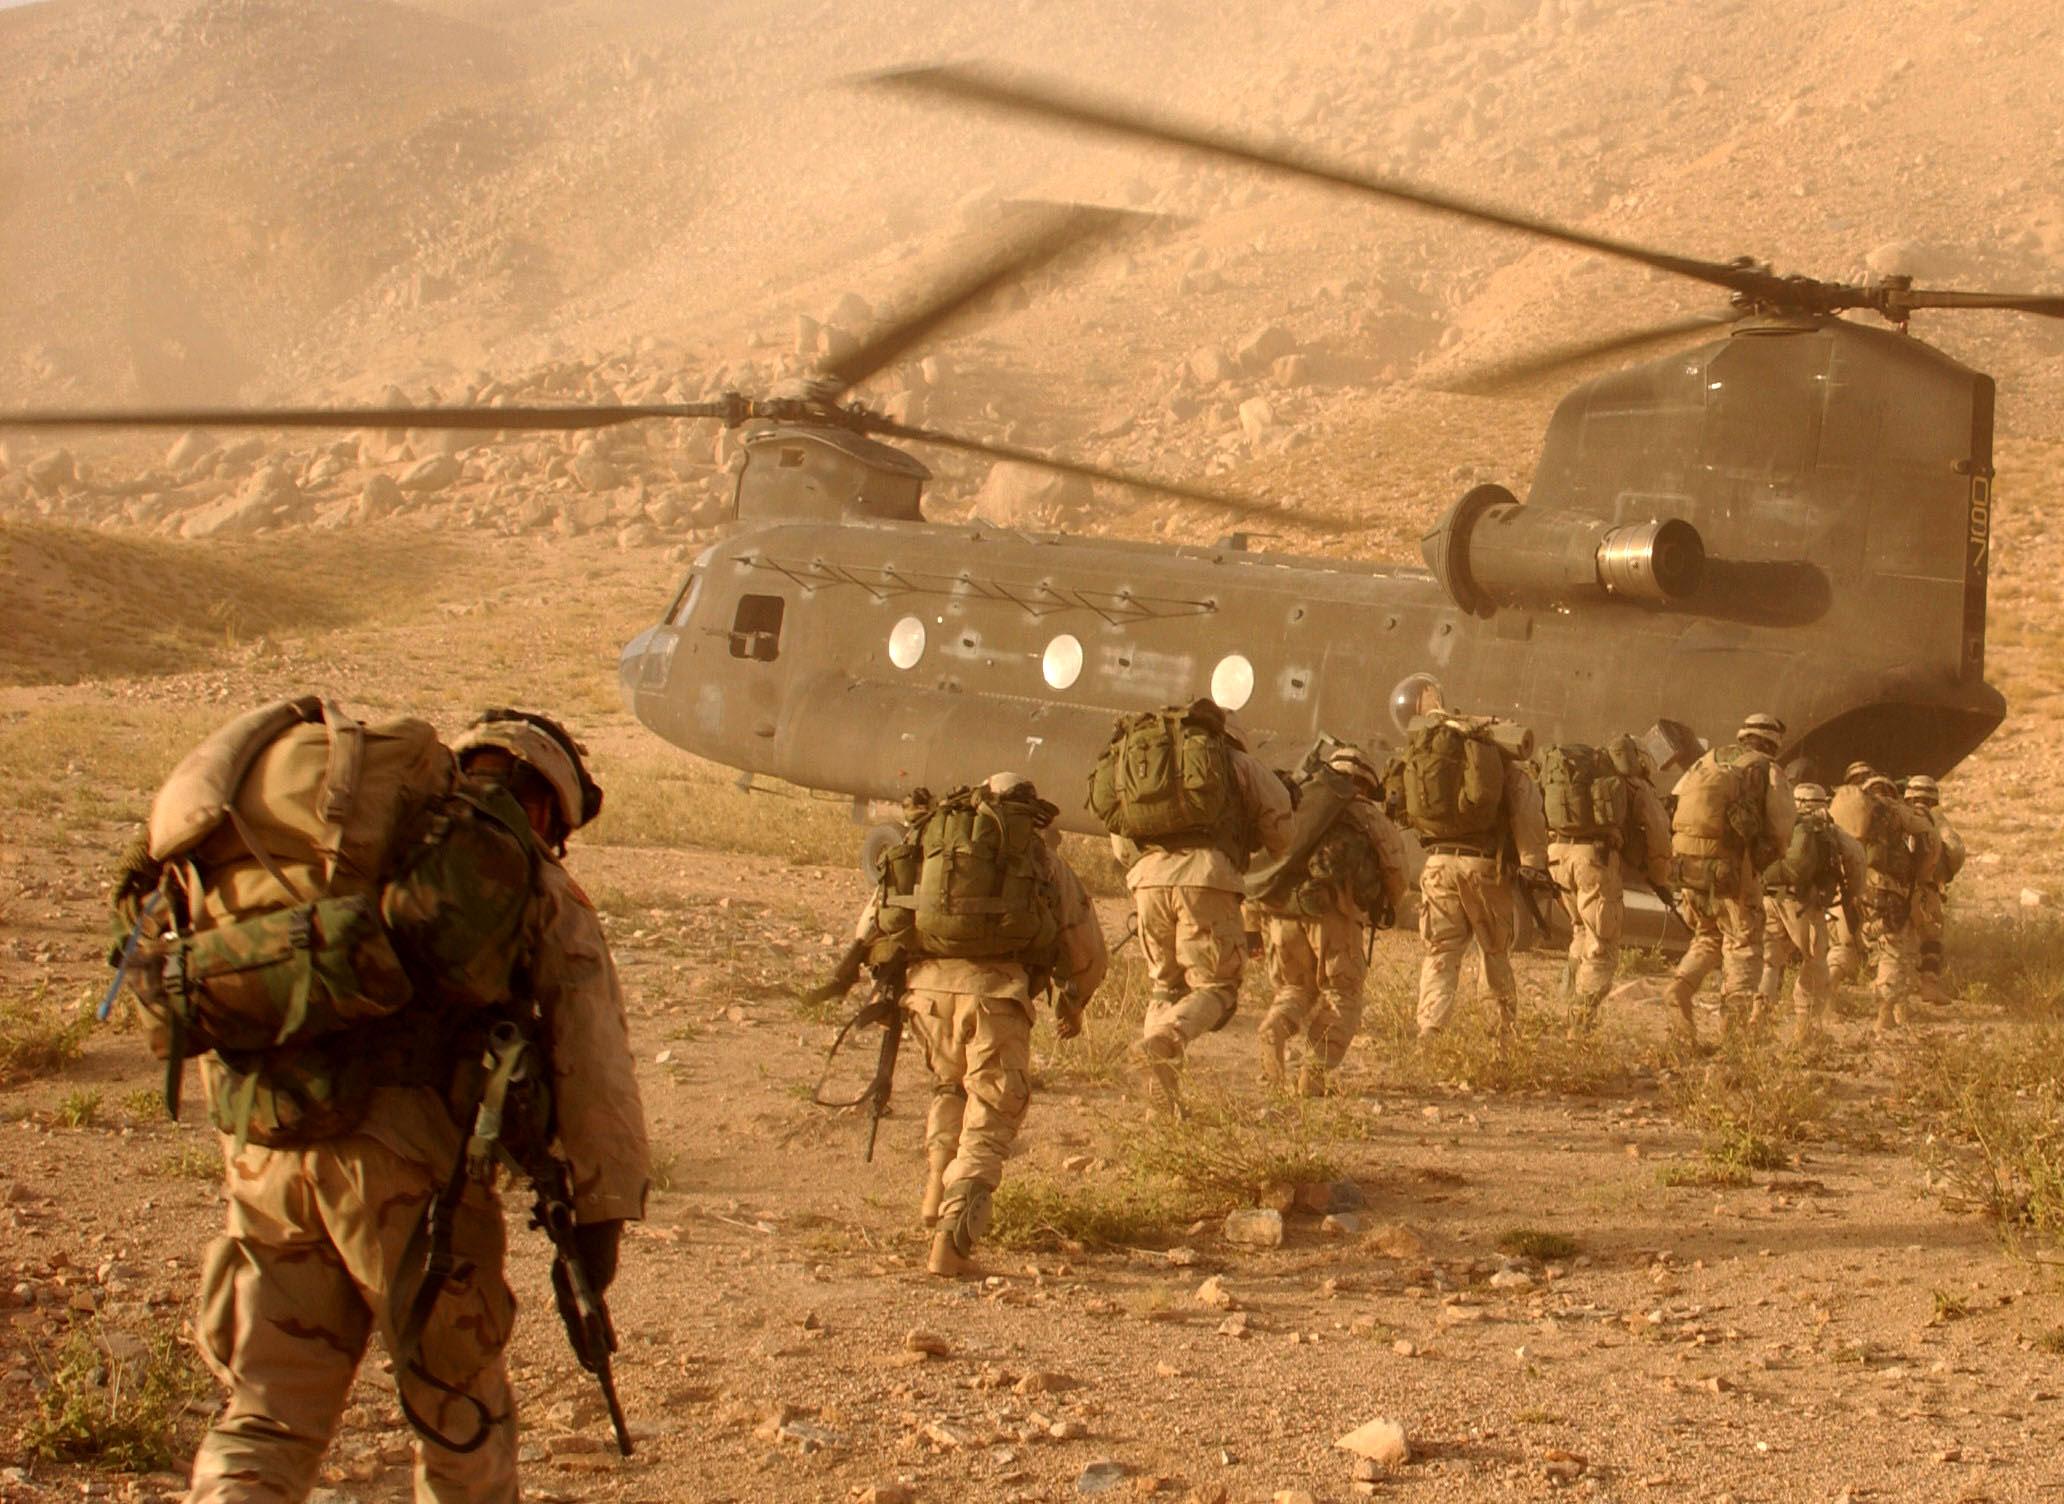 PUSULA | Dost mücahitler düşman El Kaide